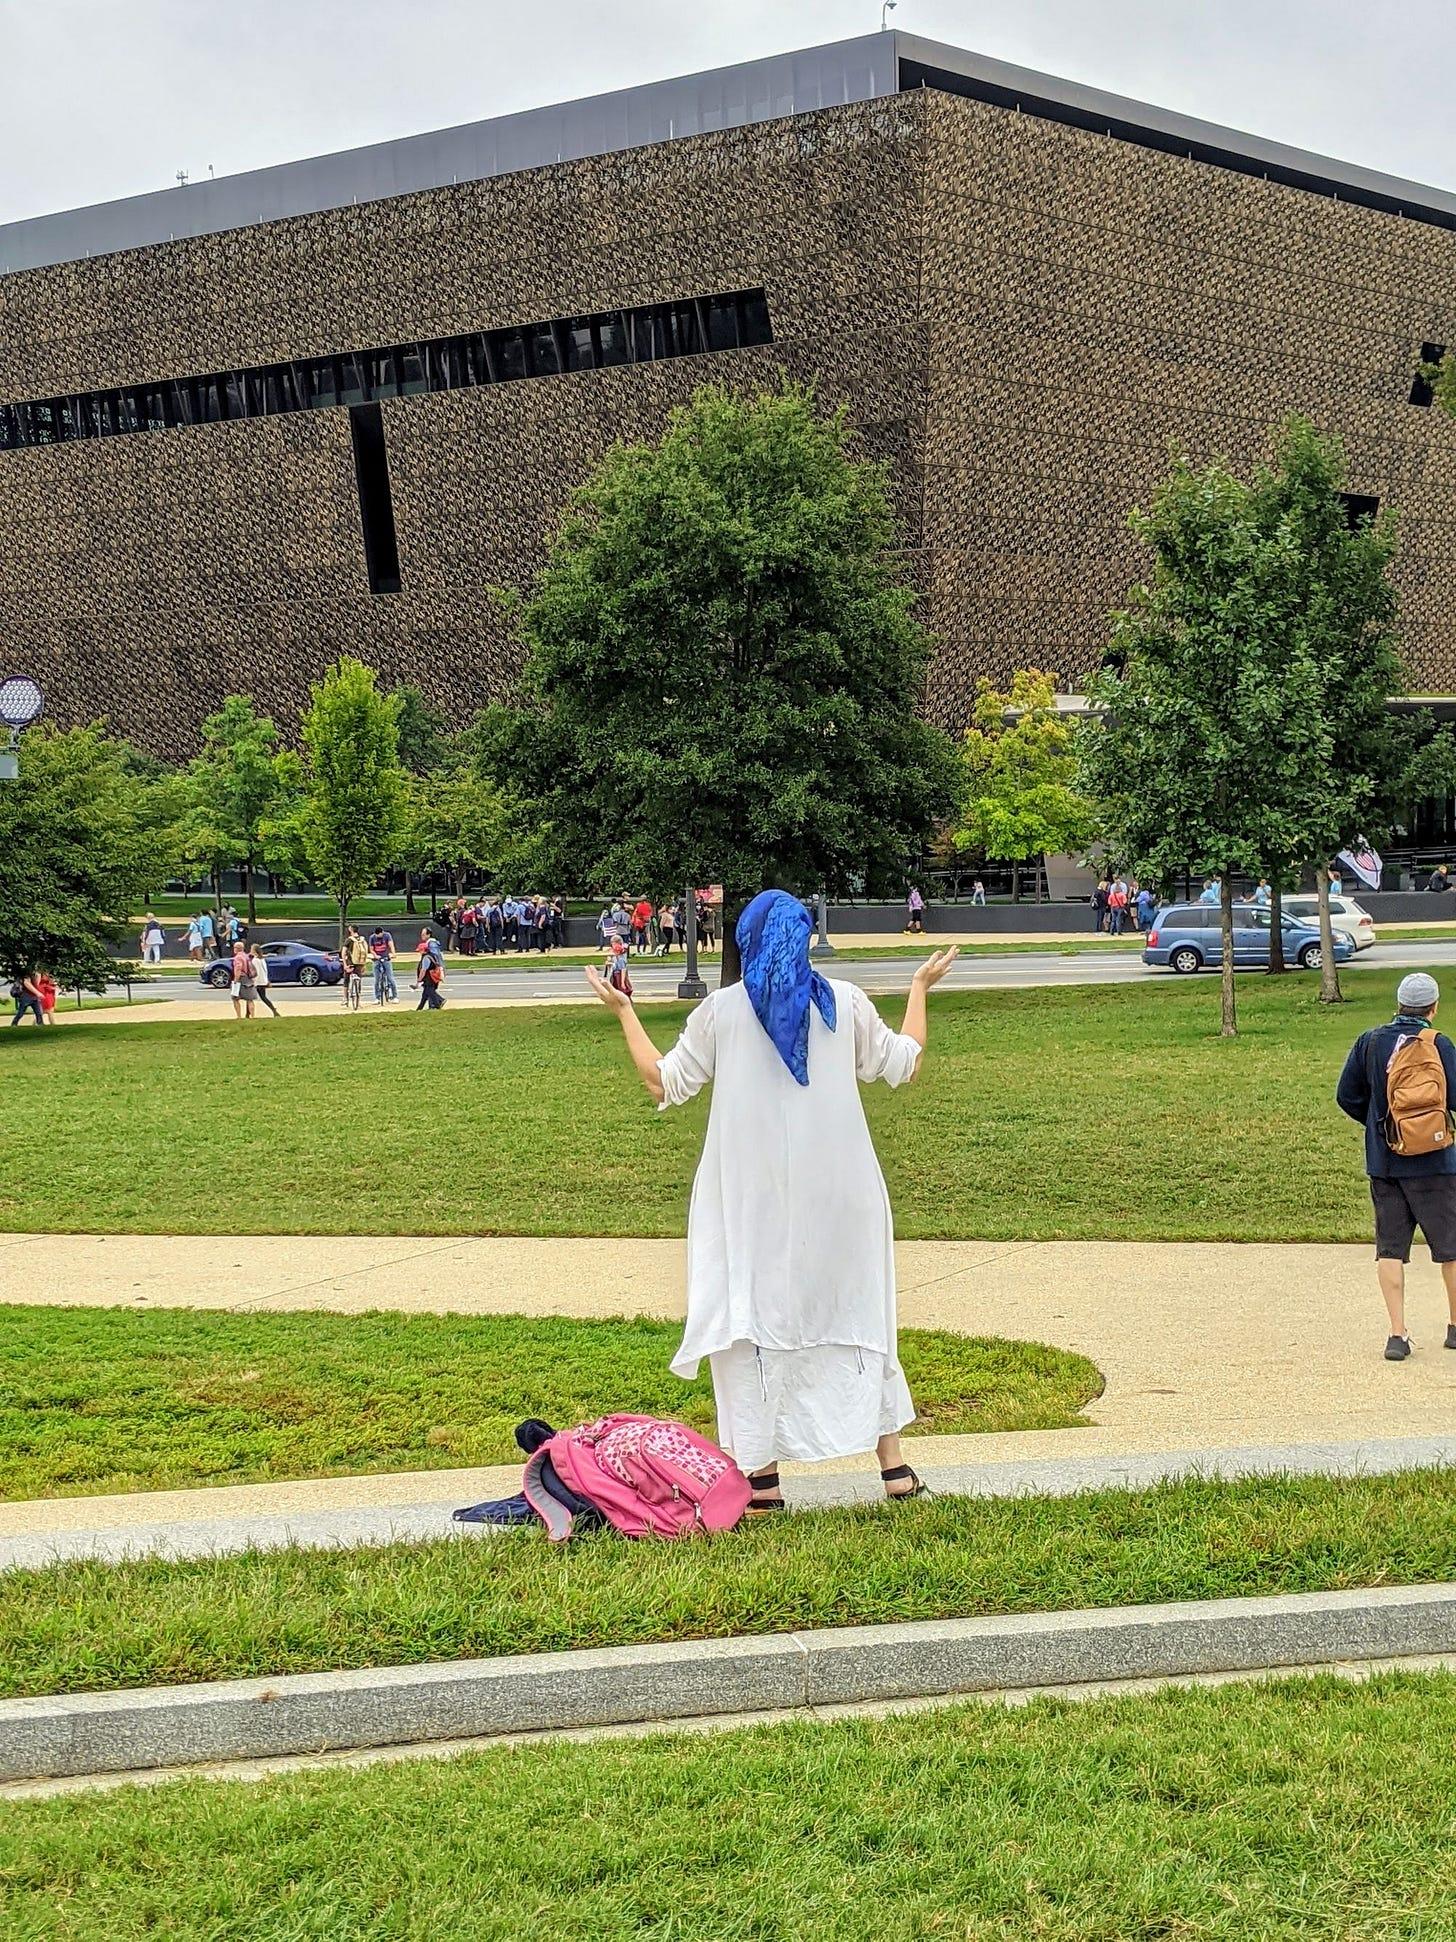 Why I Took A Trip To Washington D.C. To Pray